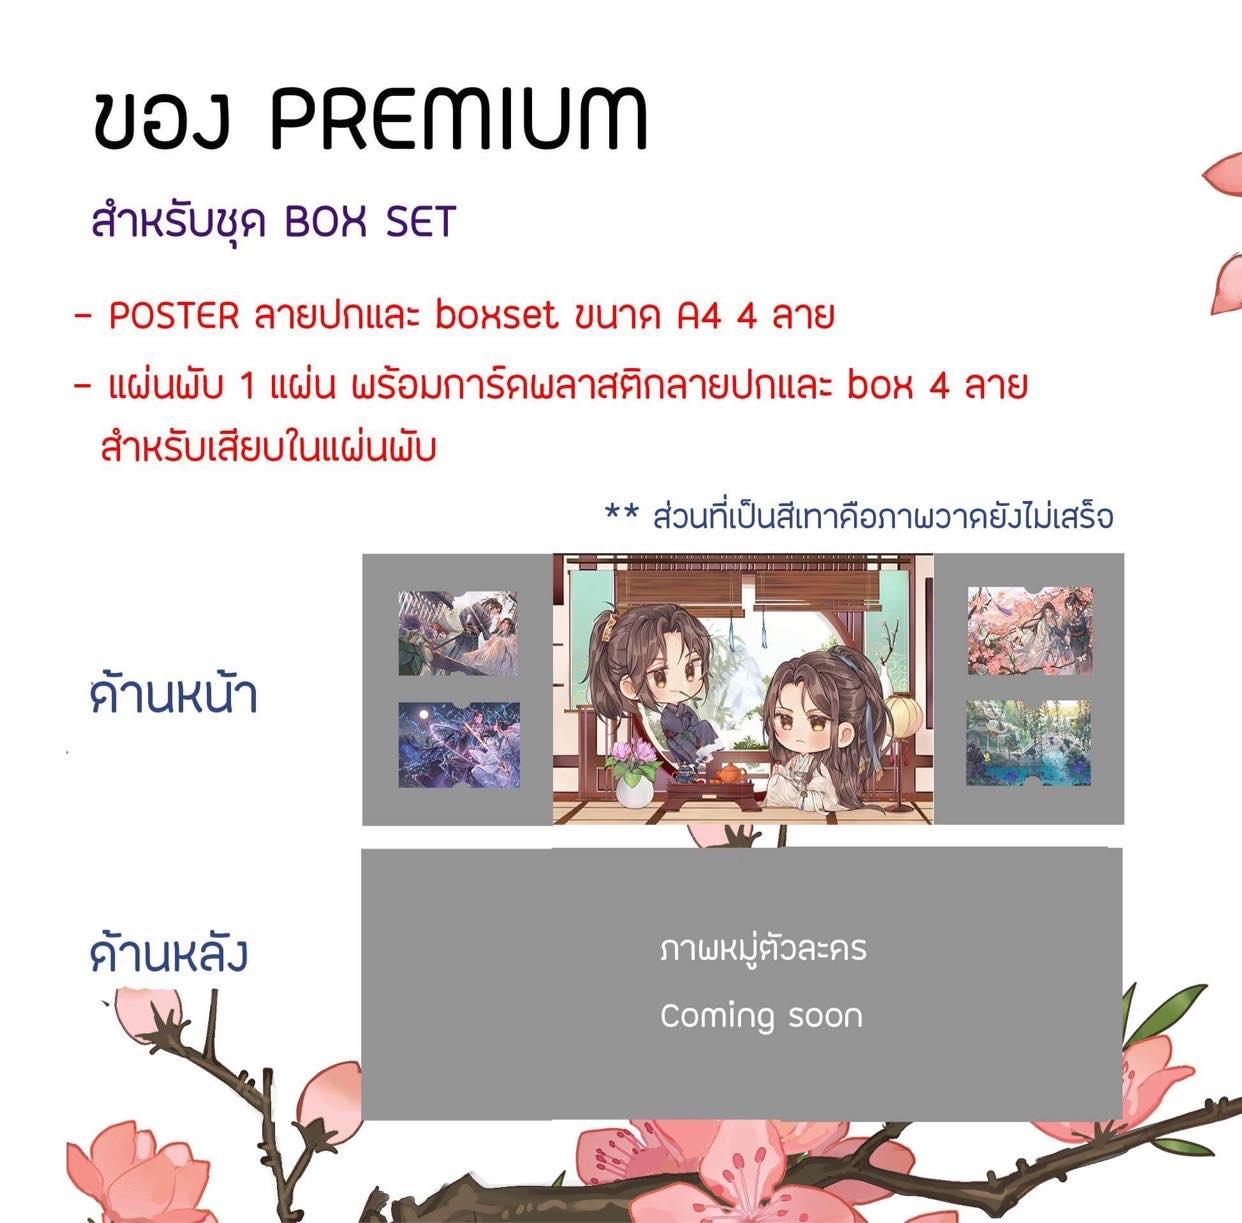 Pre Order) Boxset หวนคู่เคียงนิรันดร์ (3 เล่มจบ) - MBOOKS : Inspired by  LnwShop.com